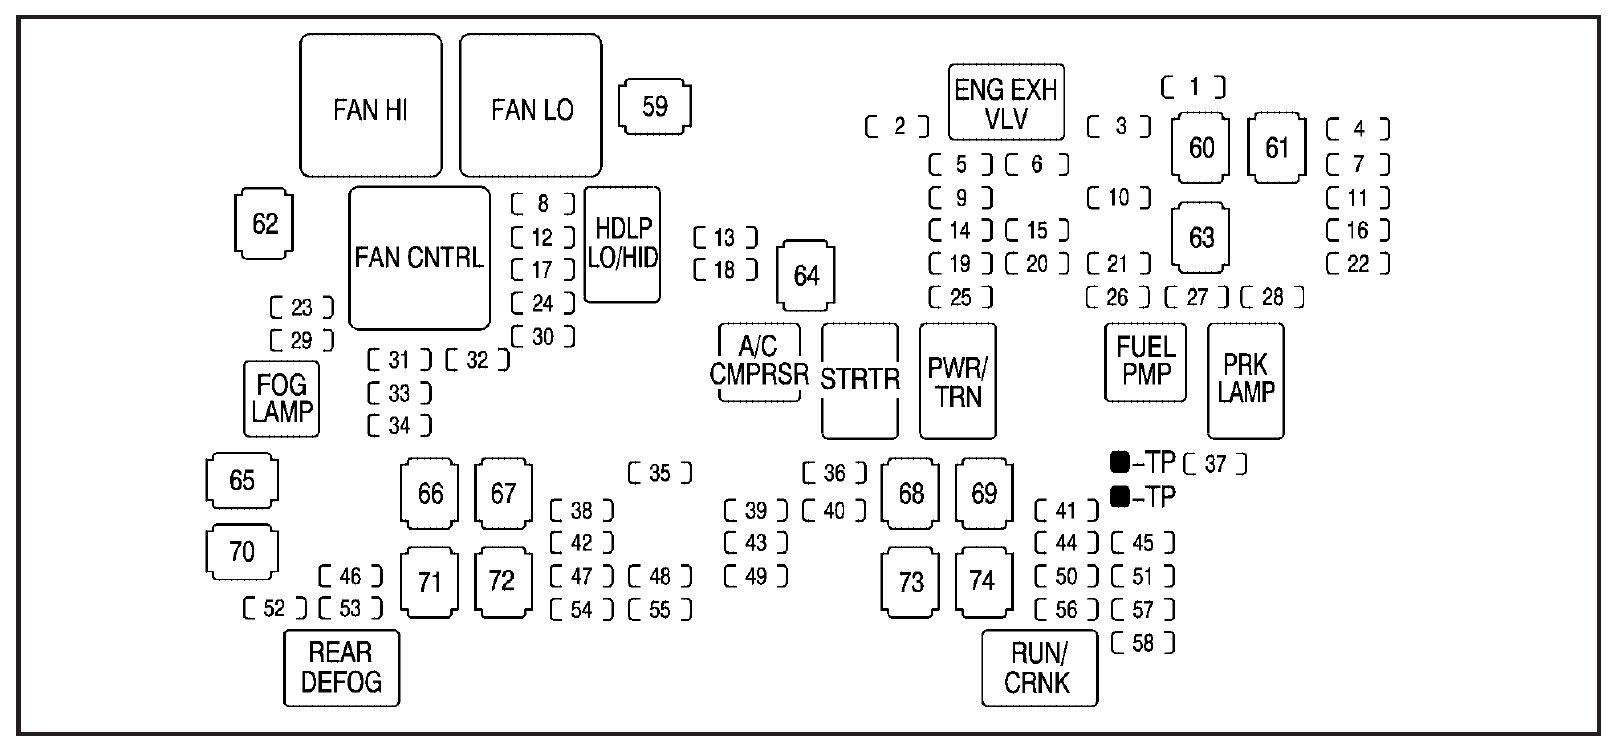 Gmc Sierra 2007 Fuse Box Diagram Carknowledge